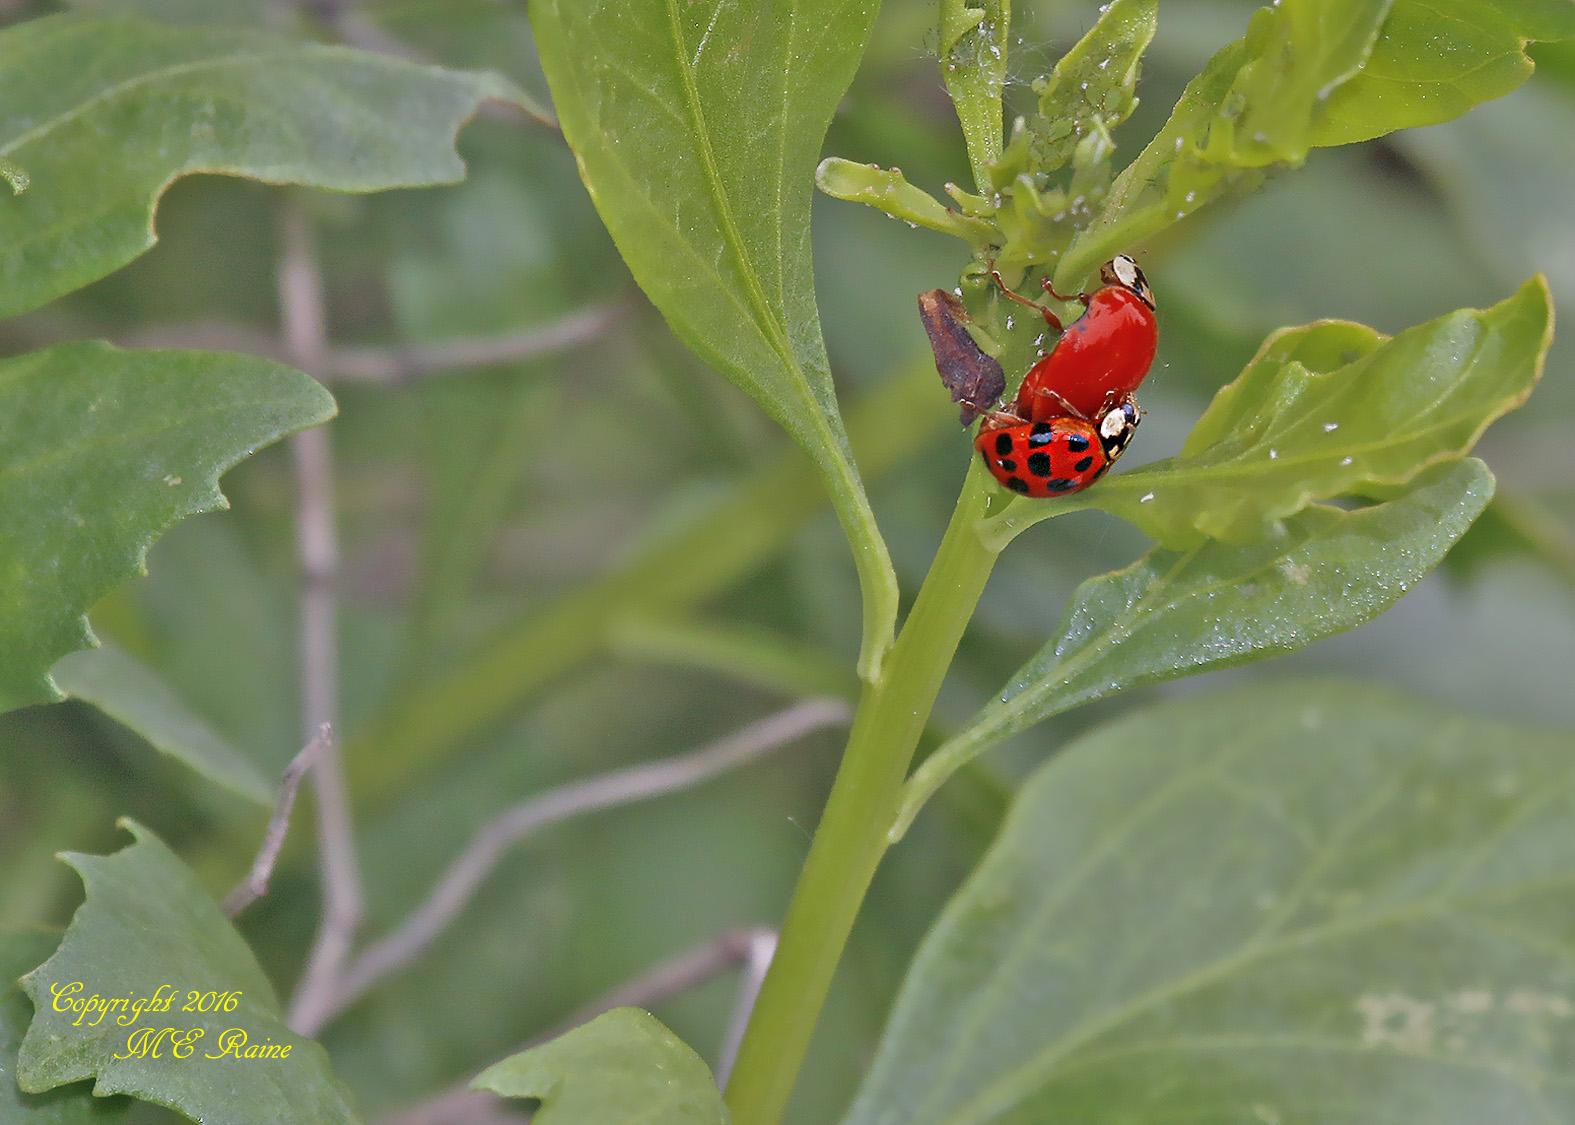 Ladybug3 MCM 5.30.16